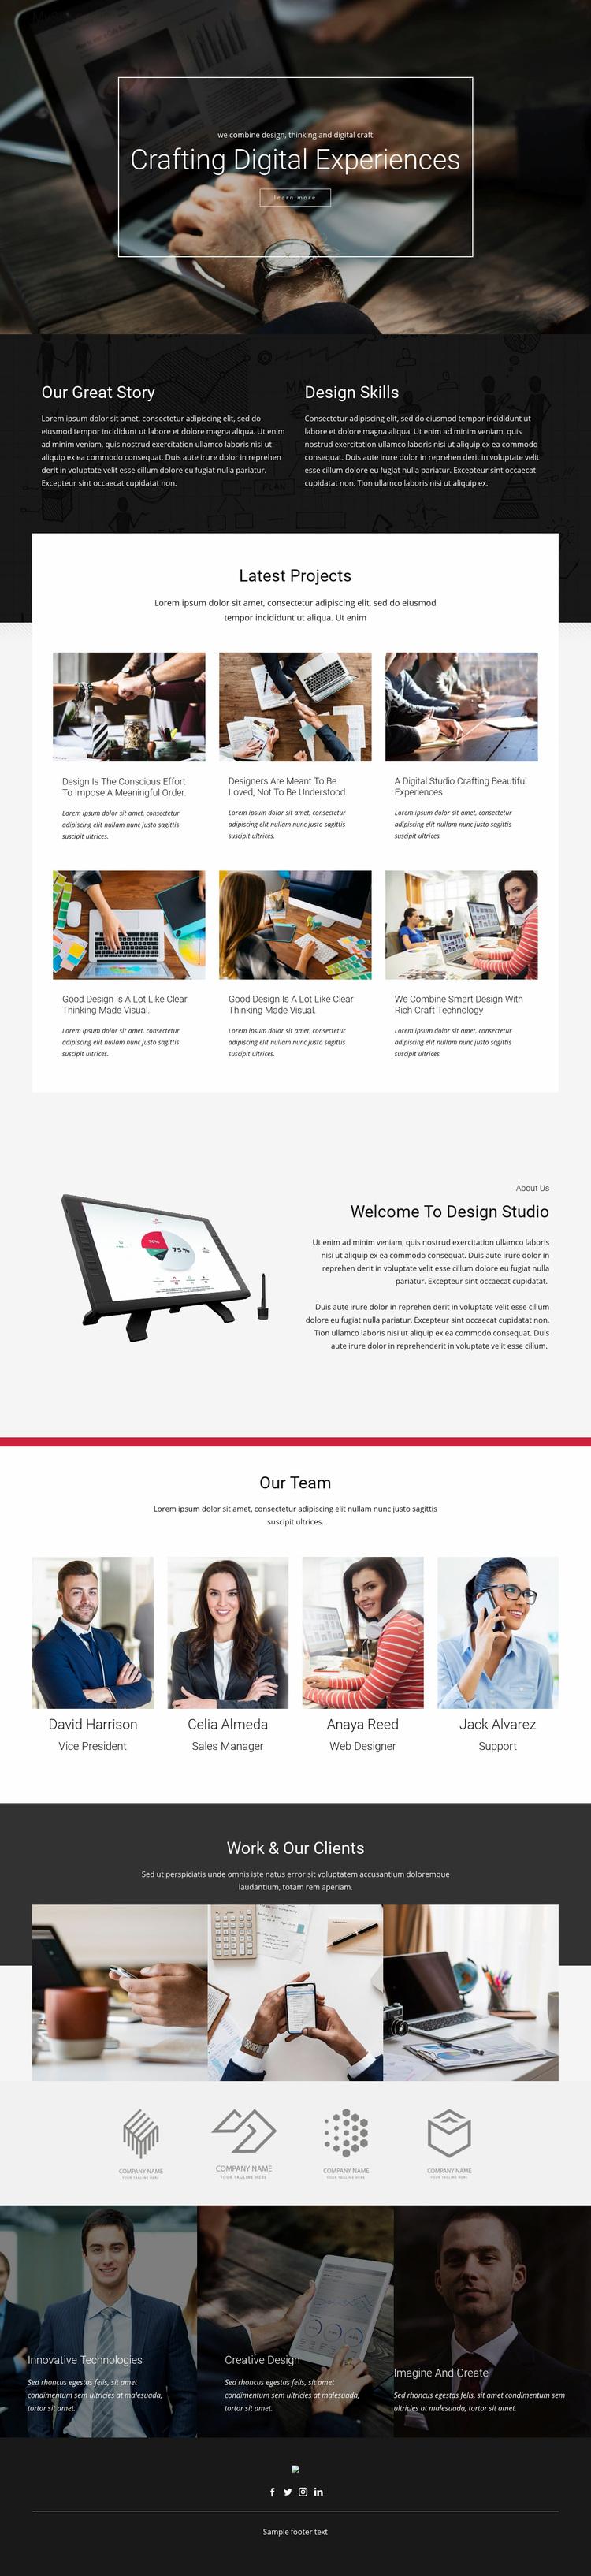 Crafting Digital Design Studio Web Page Designer